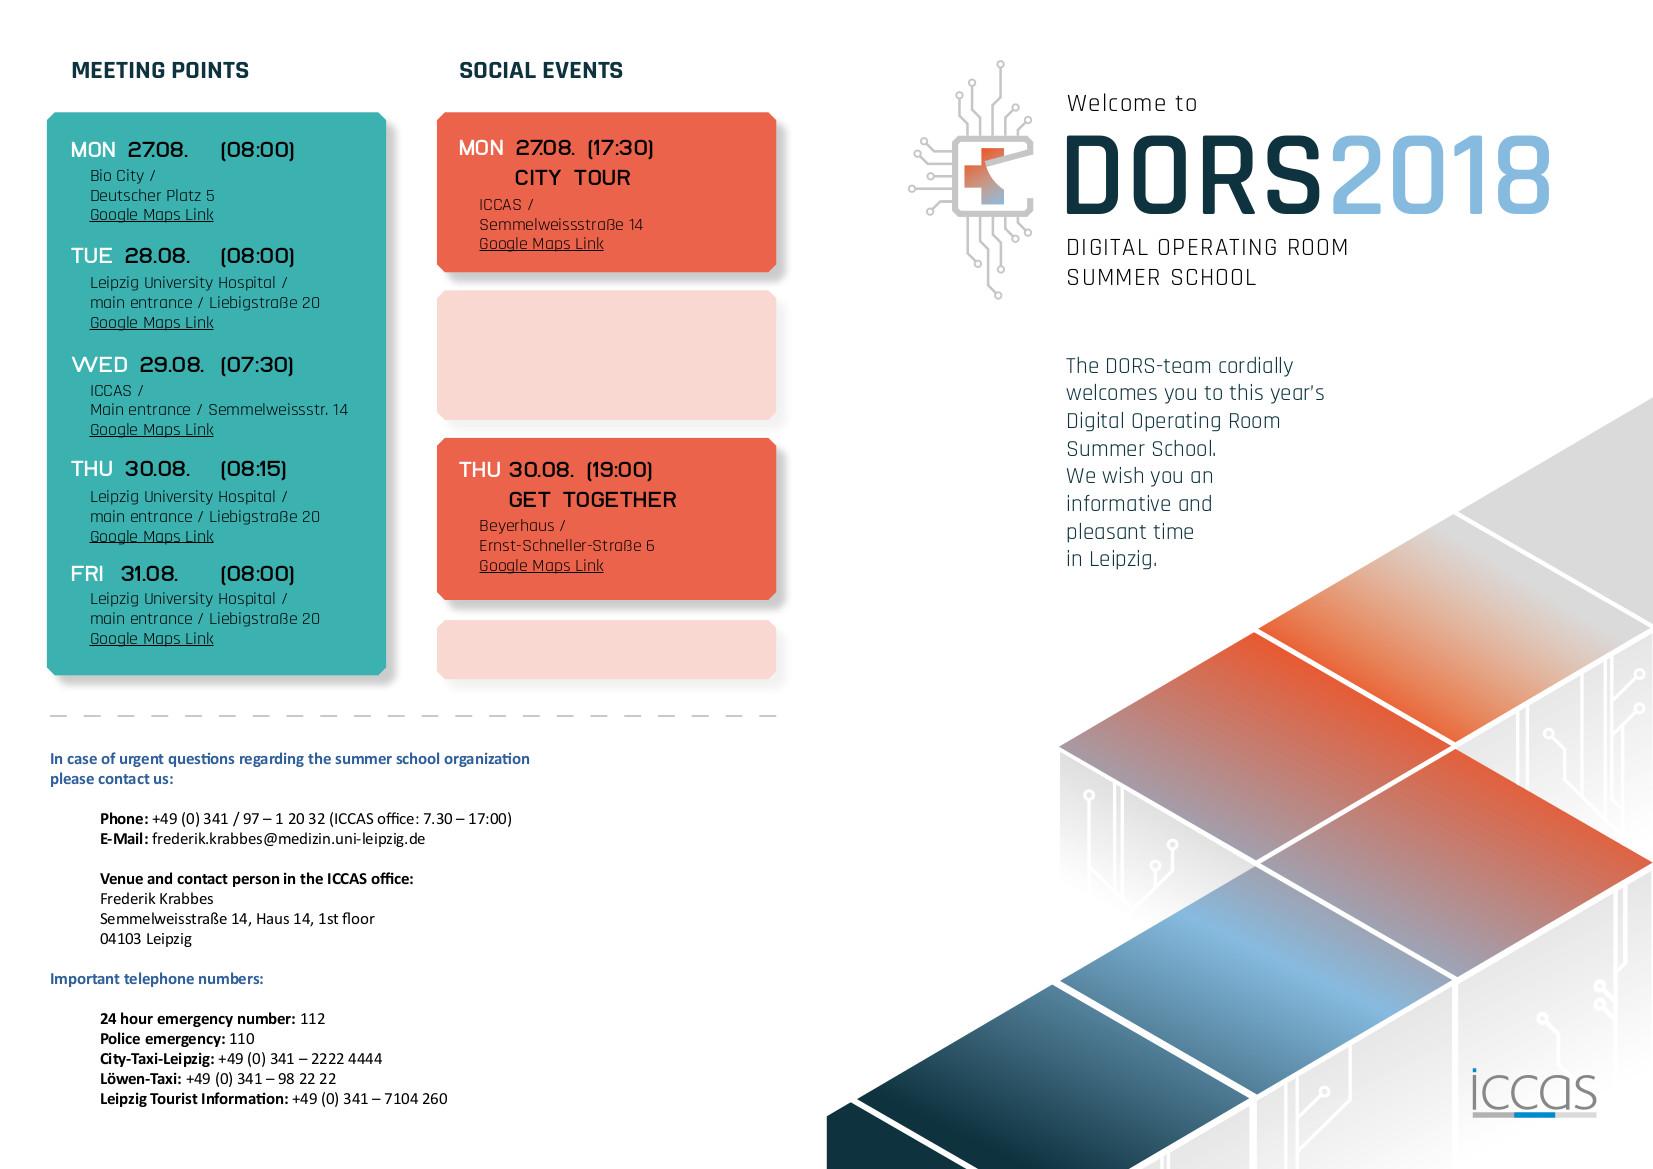 DORS 2018 Programm